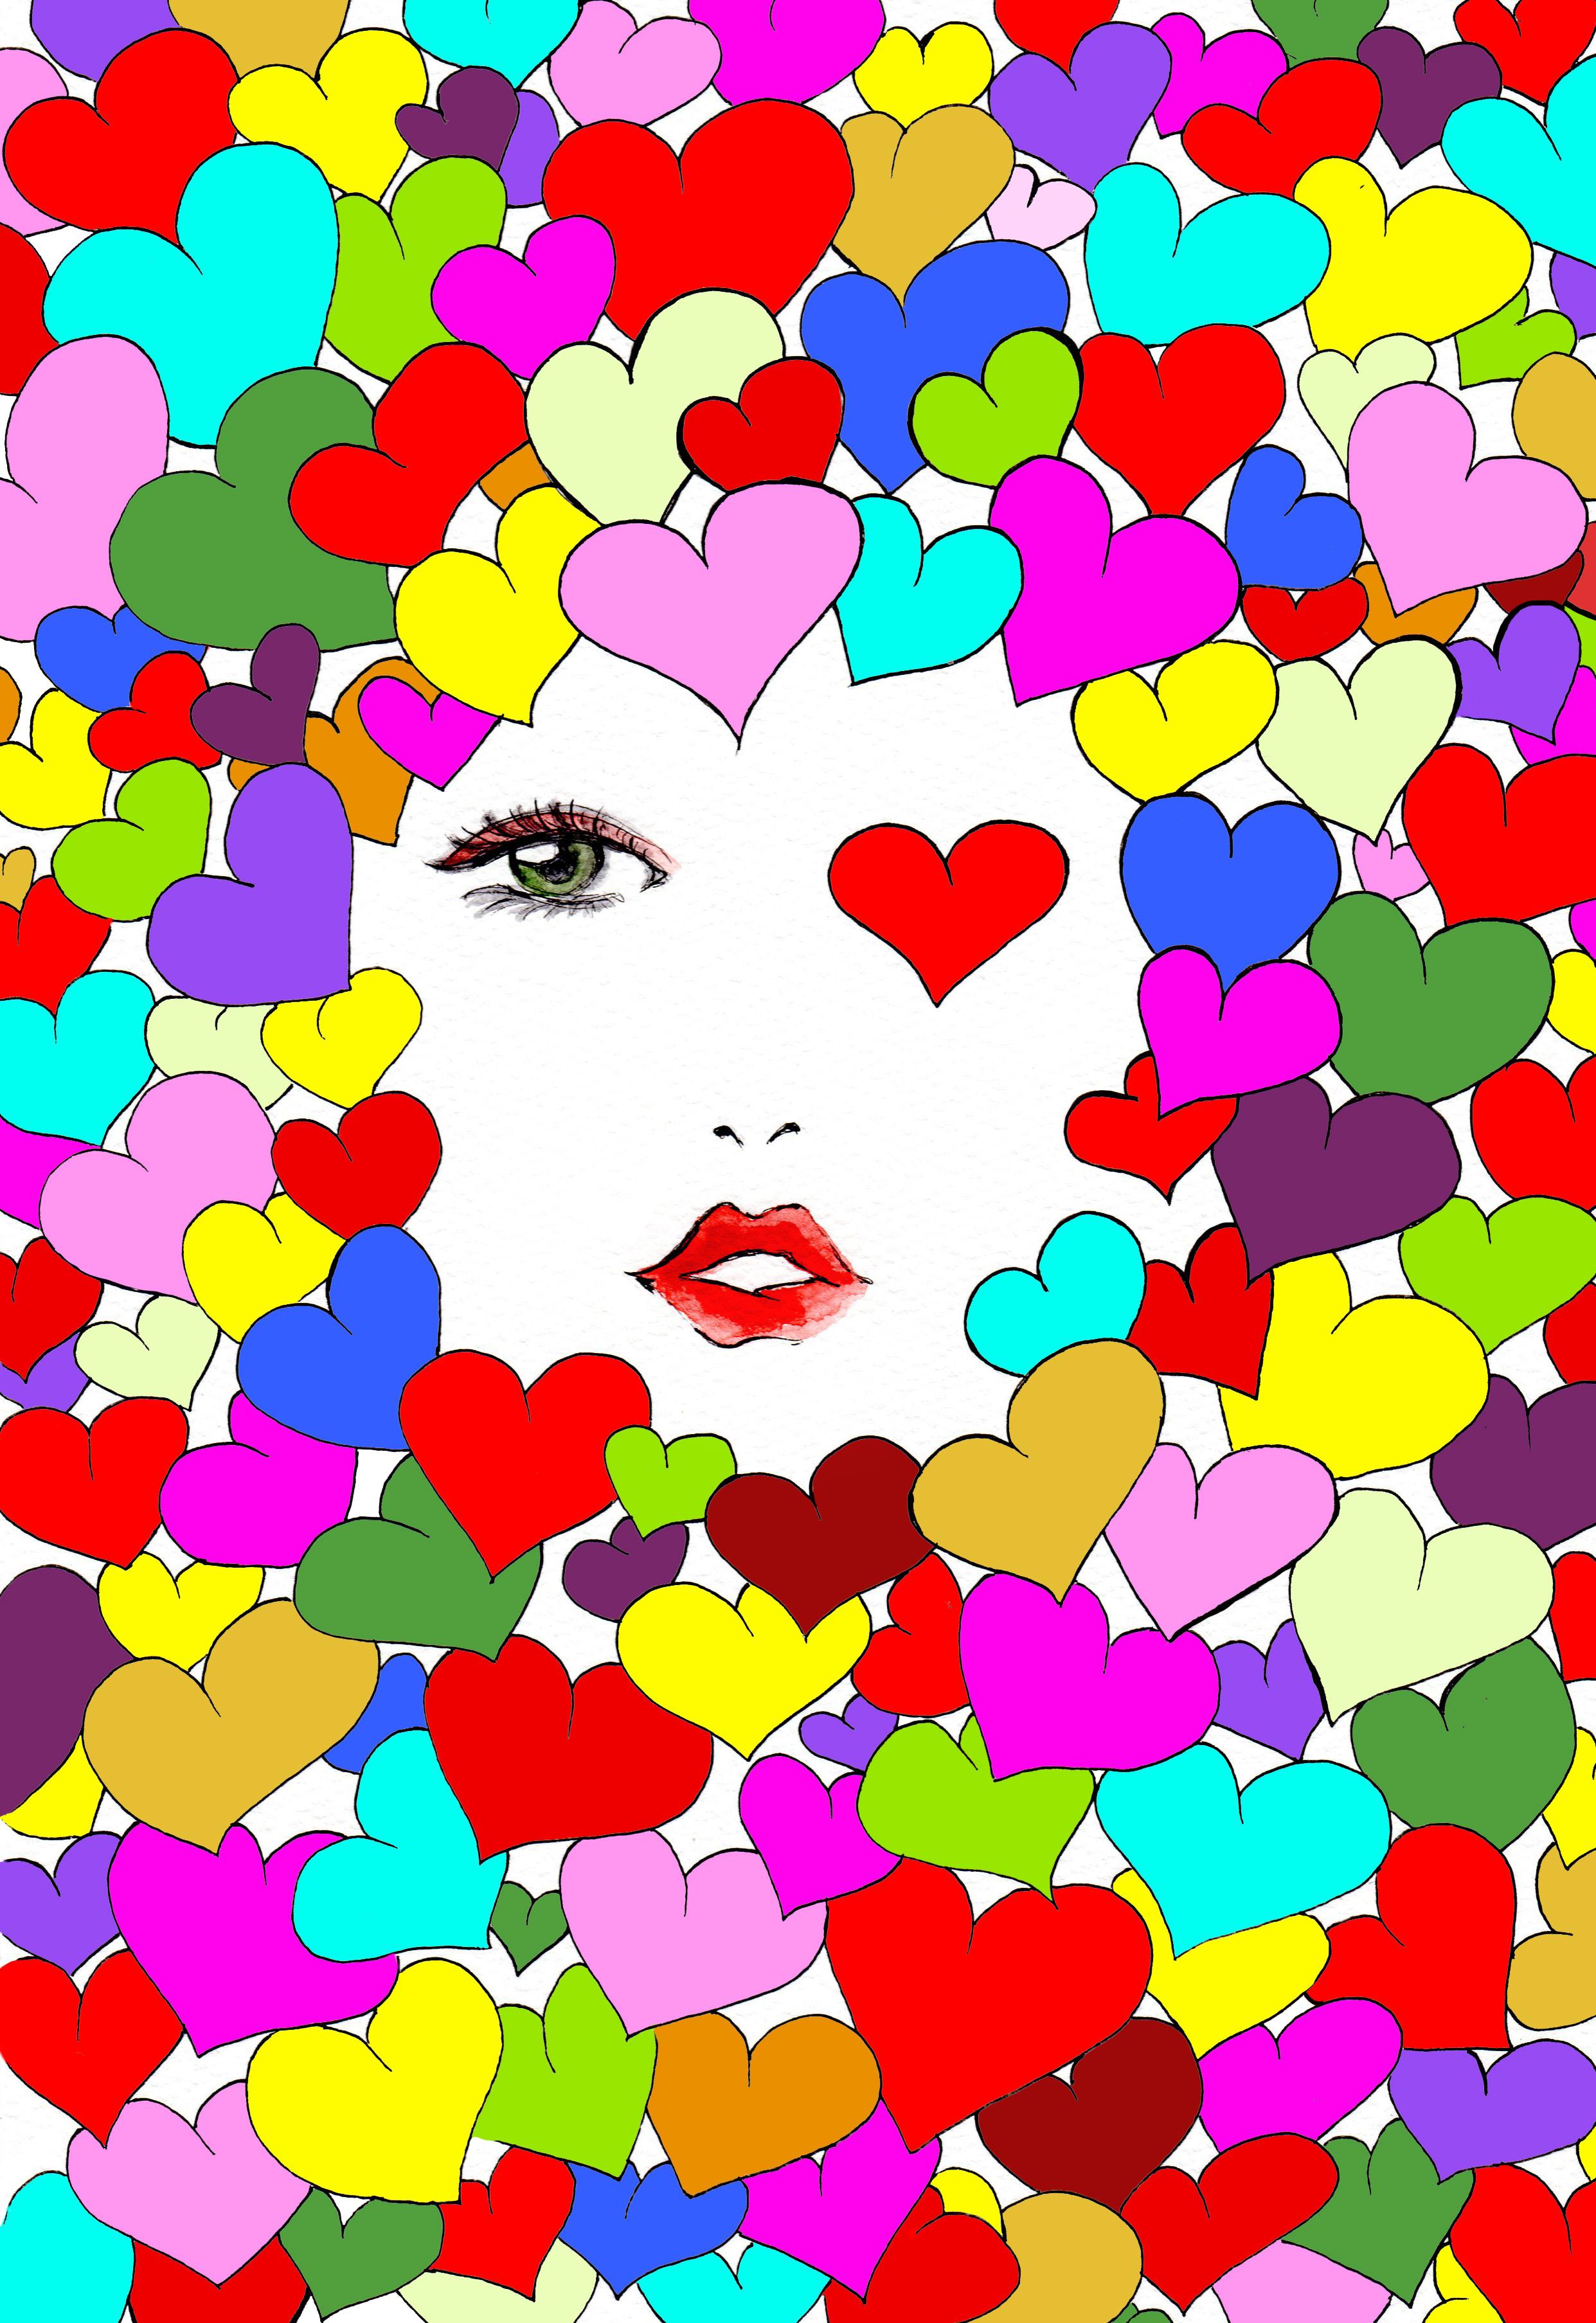 Heart chaos